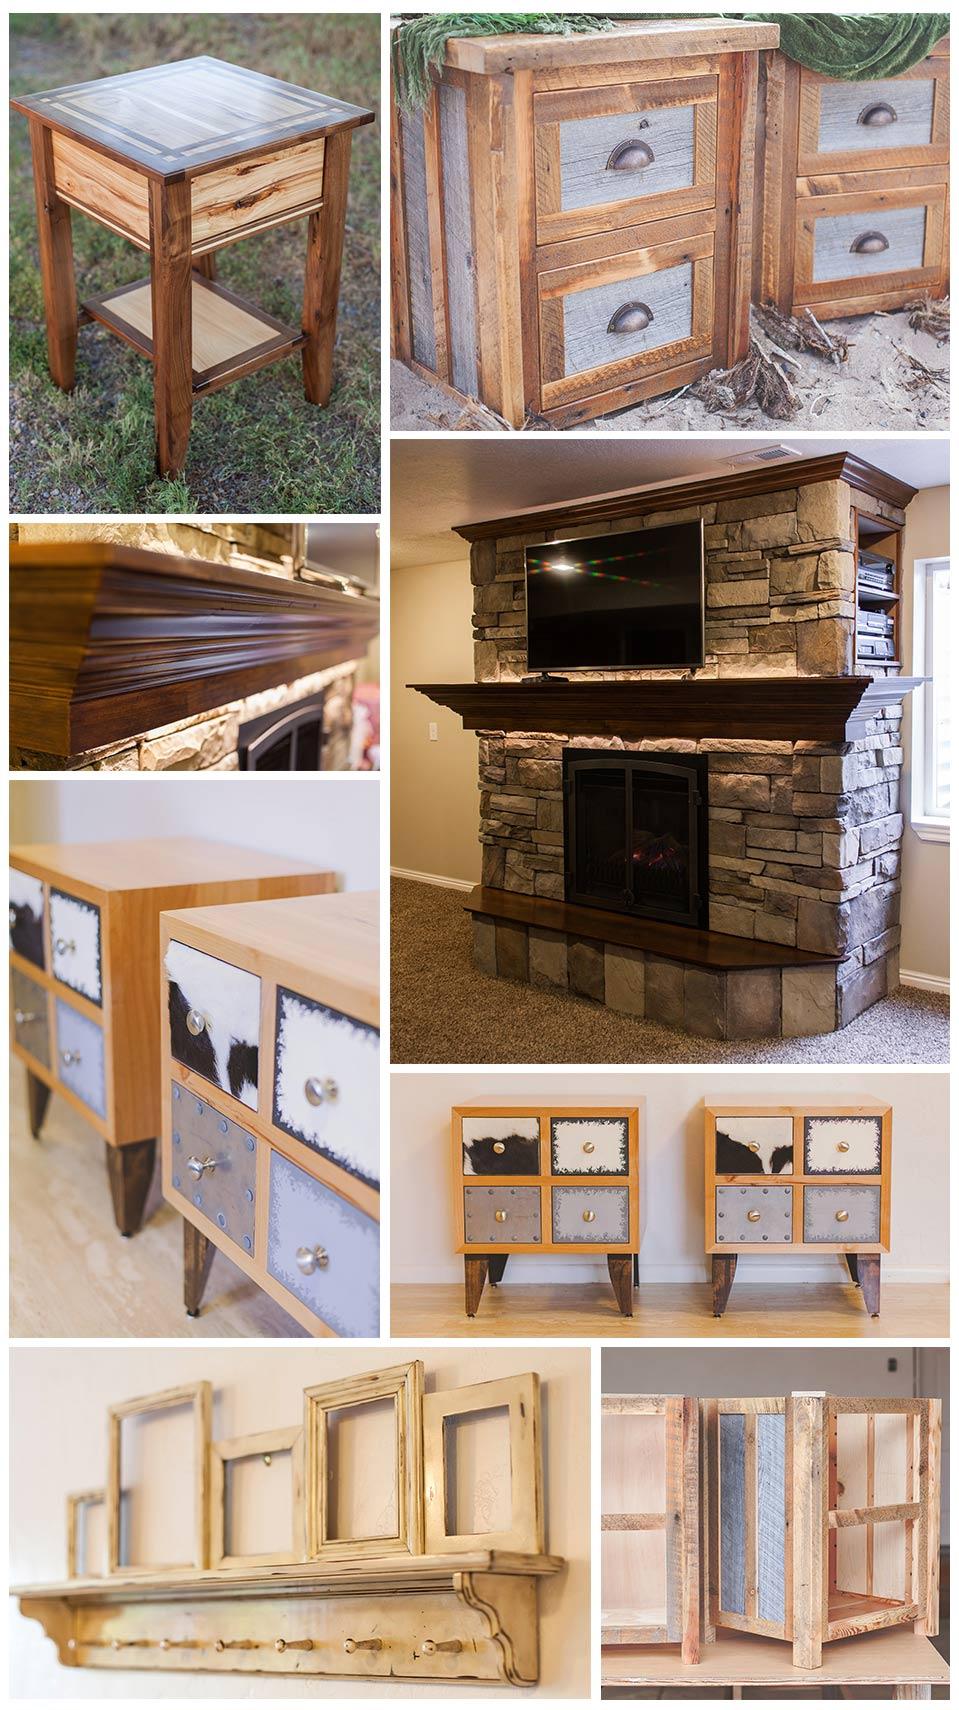 HeidiRandallstudios-CustomBranding-Utahgraphicdesign-BT-BRANDMockup-p2.jpg